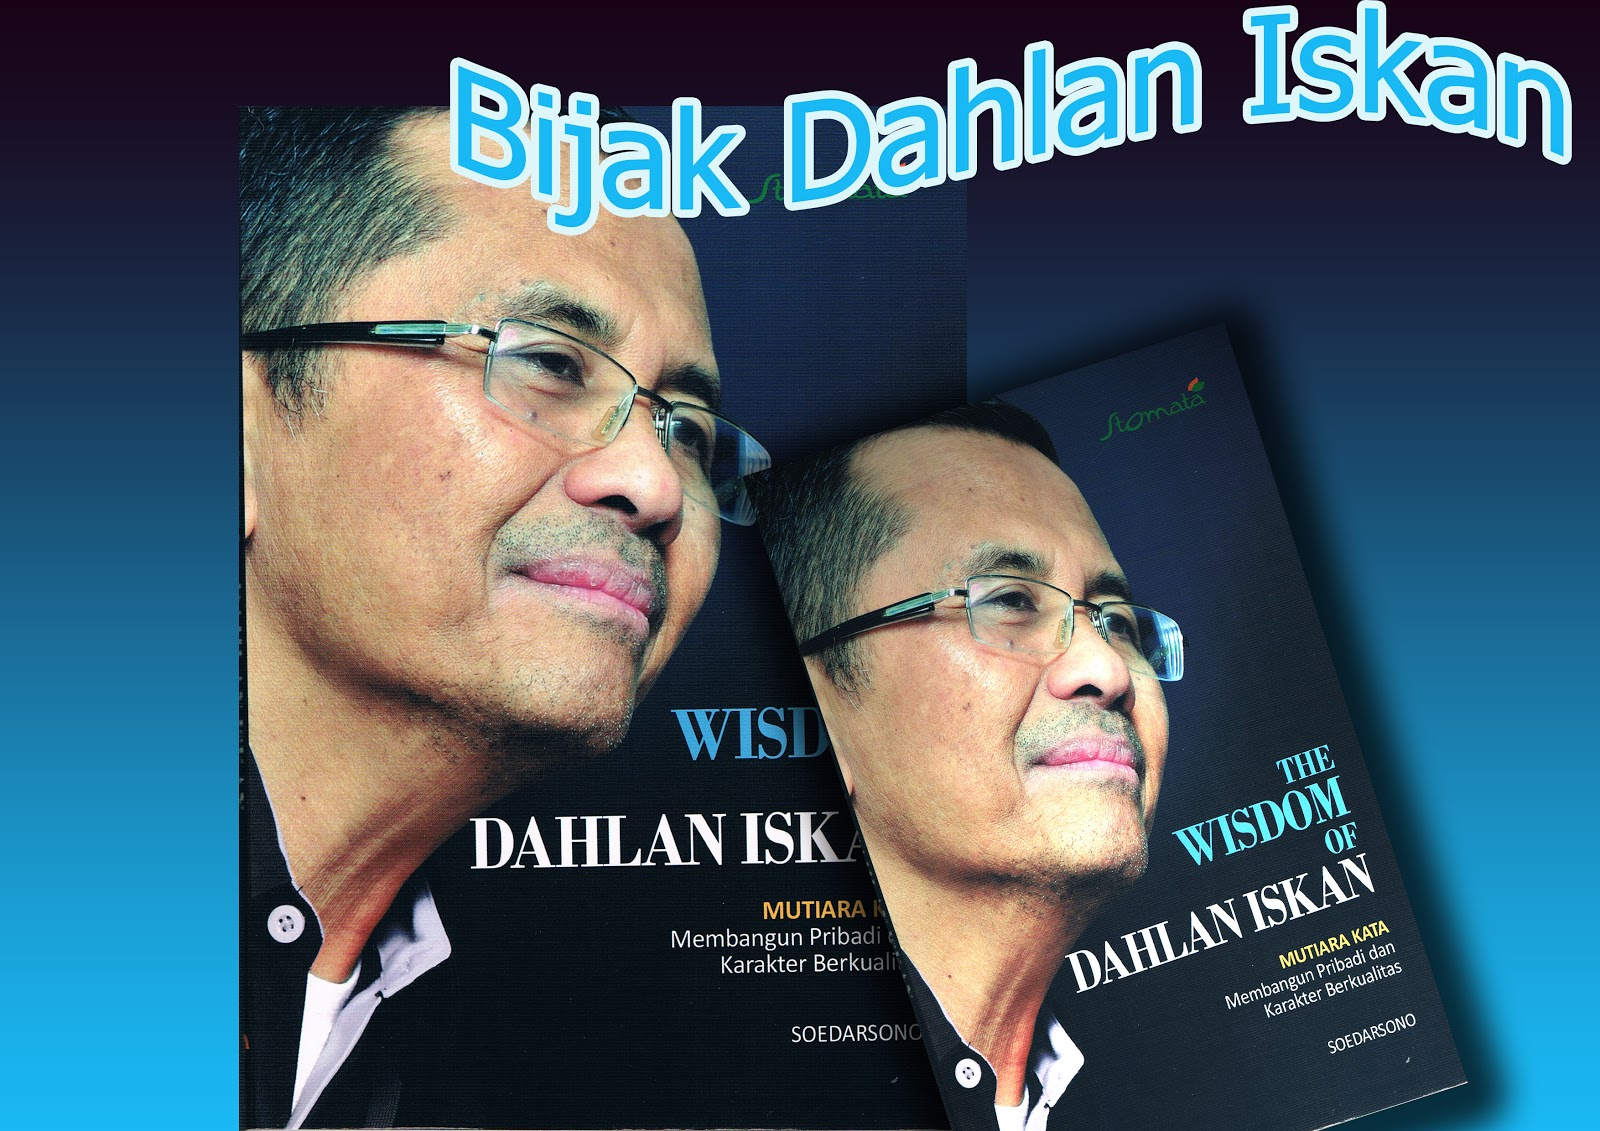 BANDAR KATA BIJAK: BIJAK DAHLAN ISKAN : THE WISDOM OF DAHLAN ISKAN